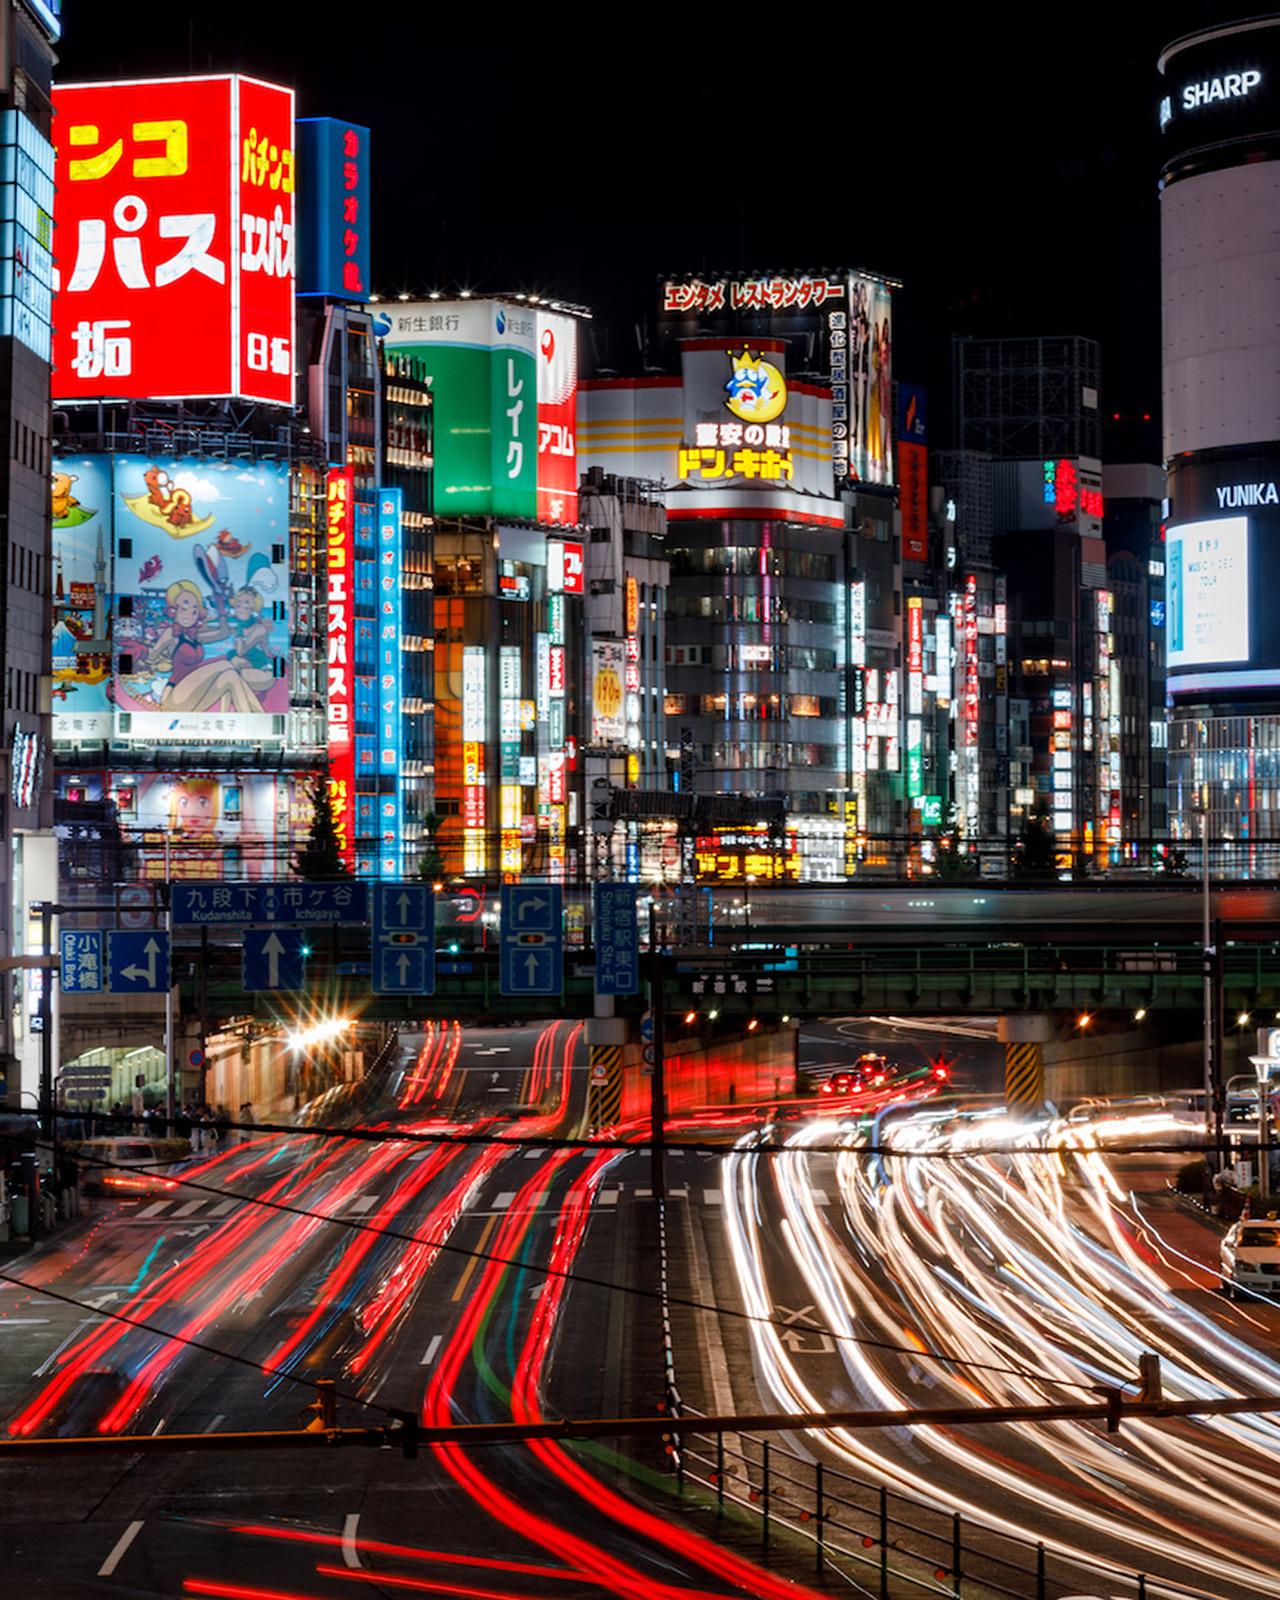 The bustling Shinjuku District at night.